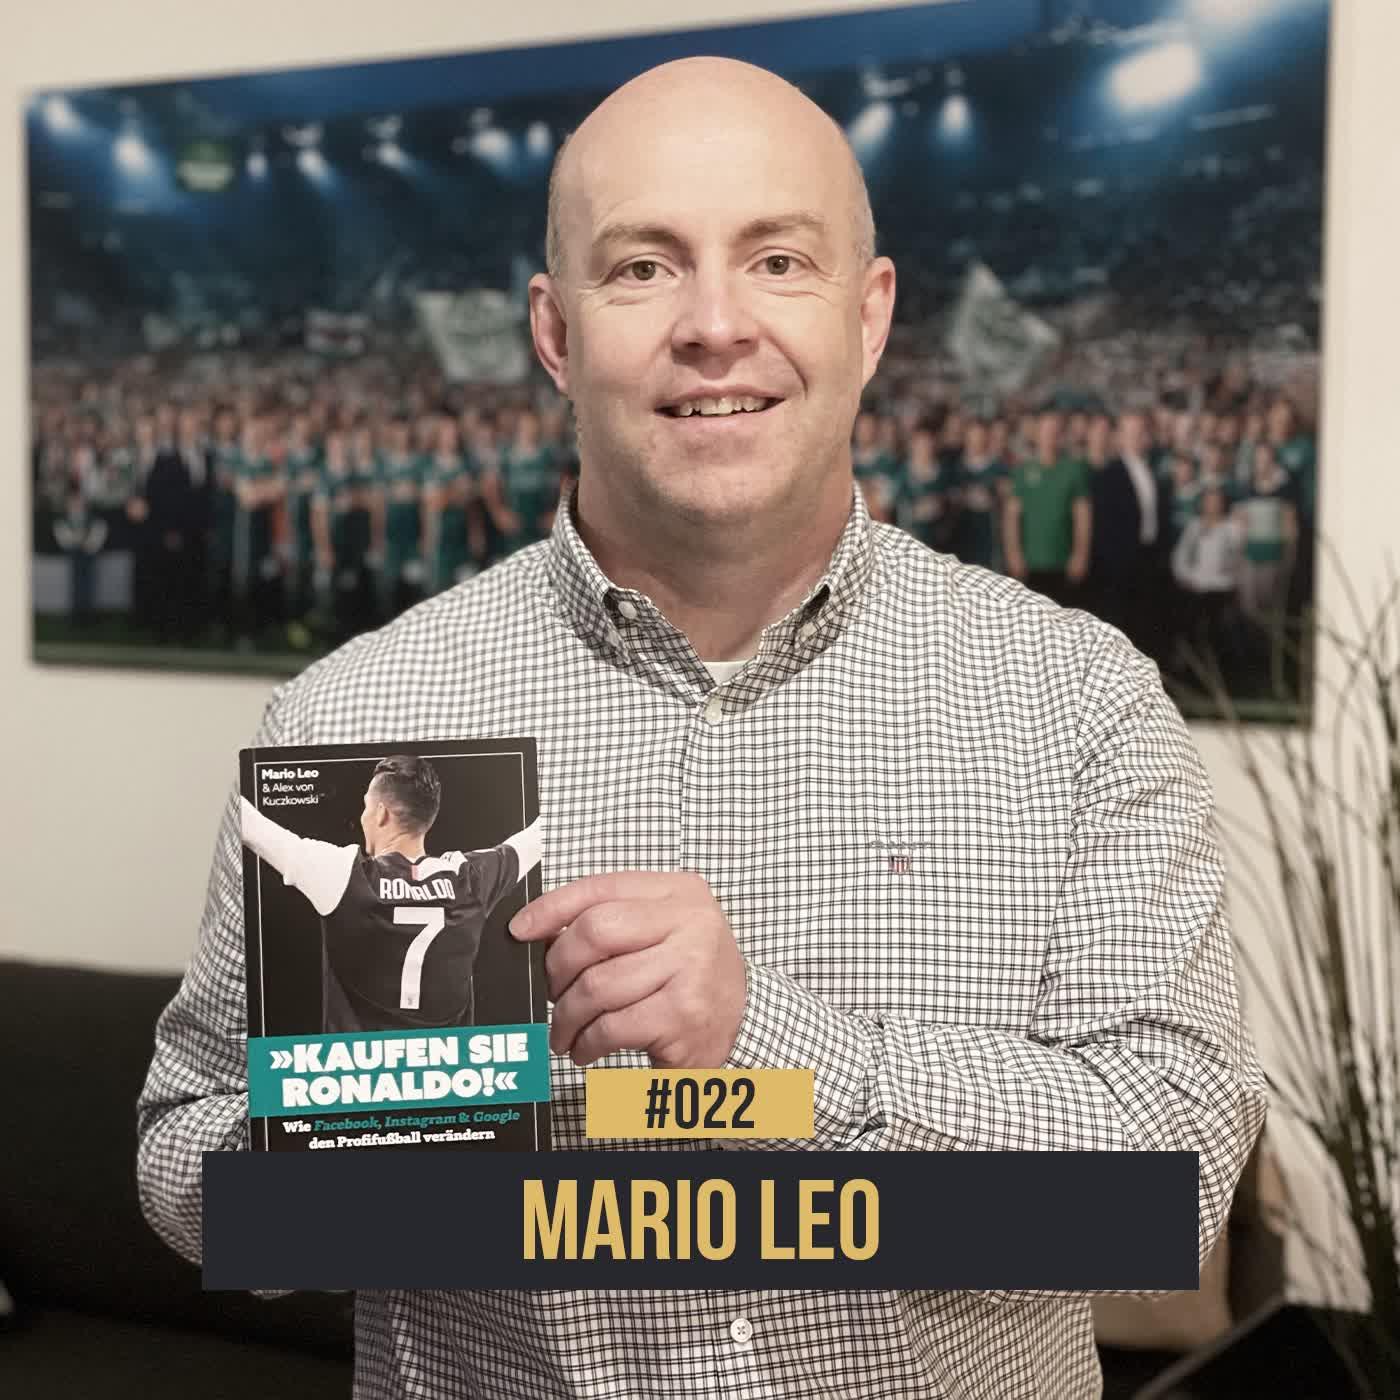 #022 Mario Leo: Deutschlands Experte für Social-Media-Stats